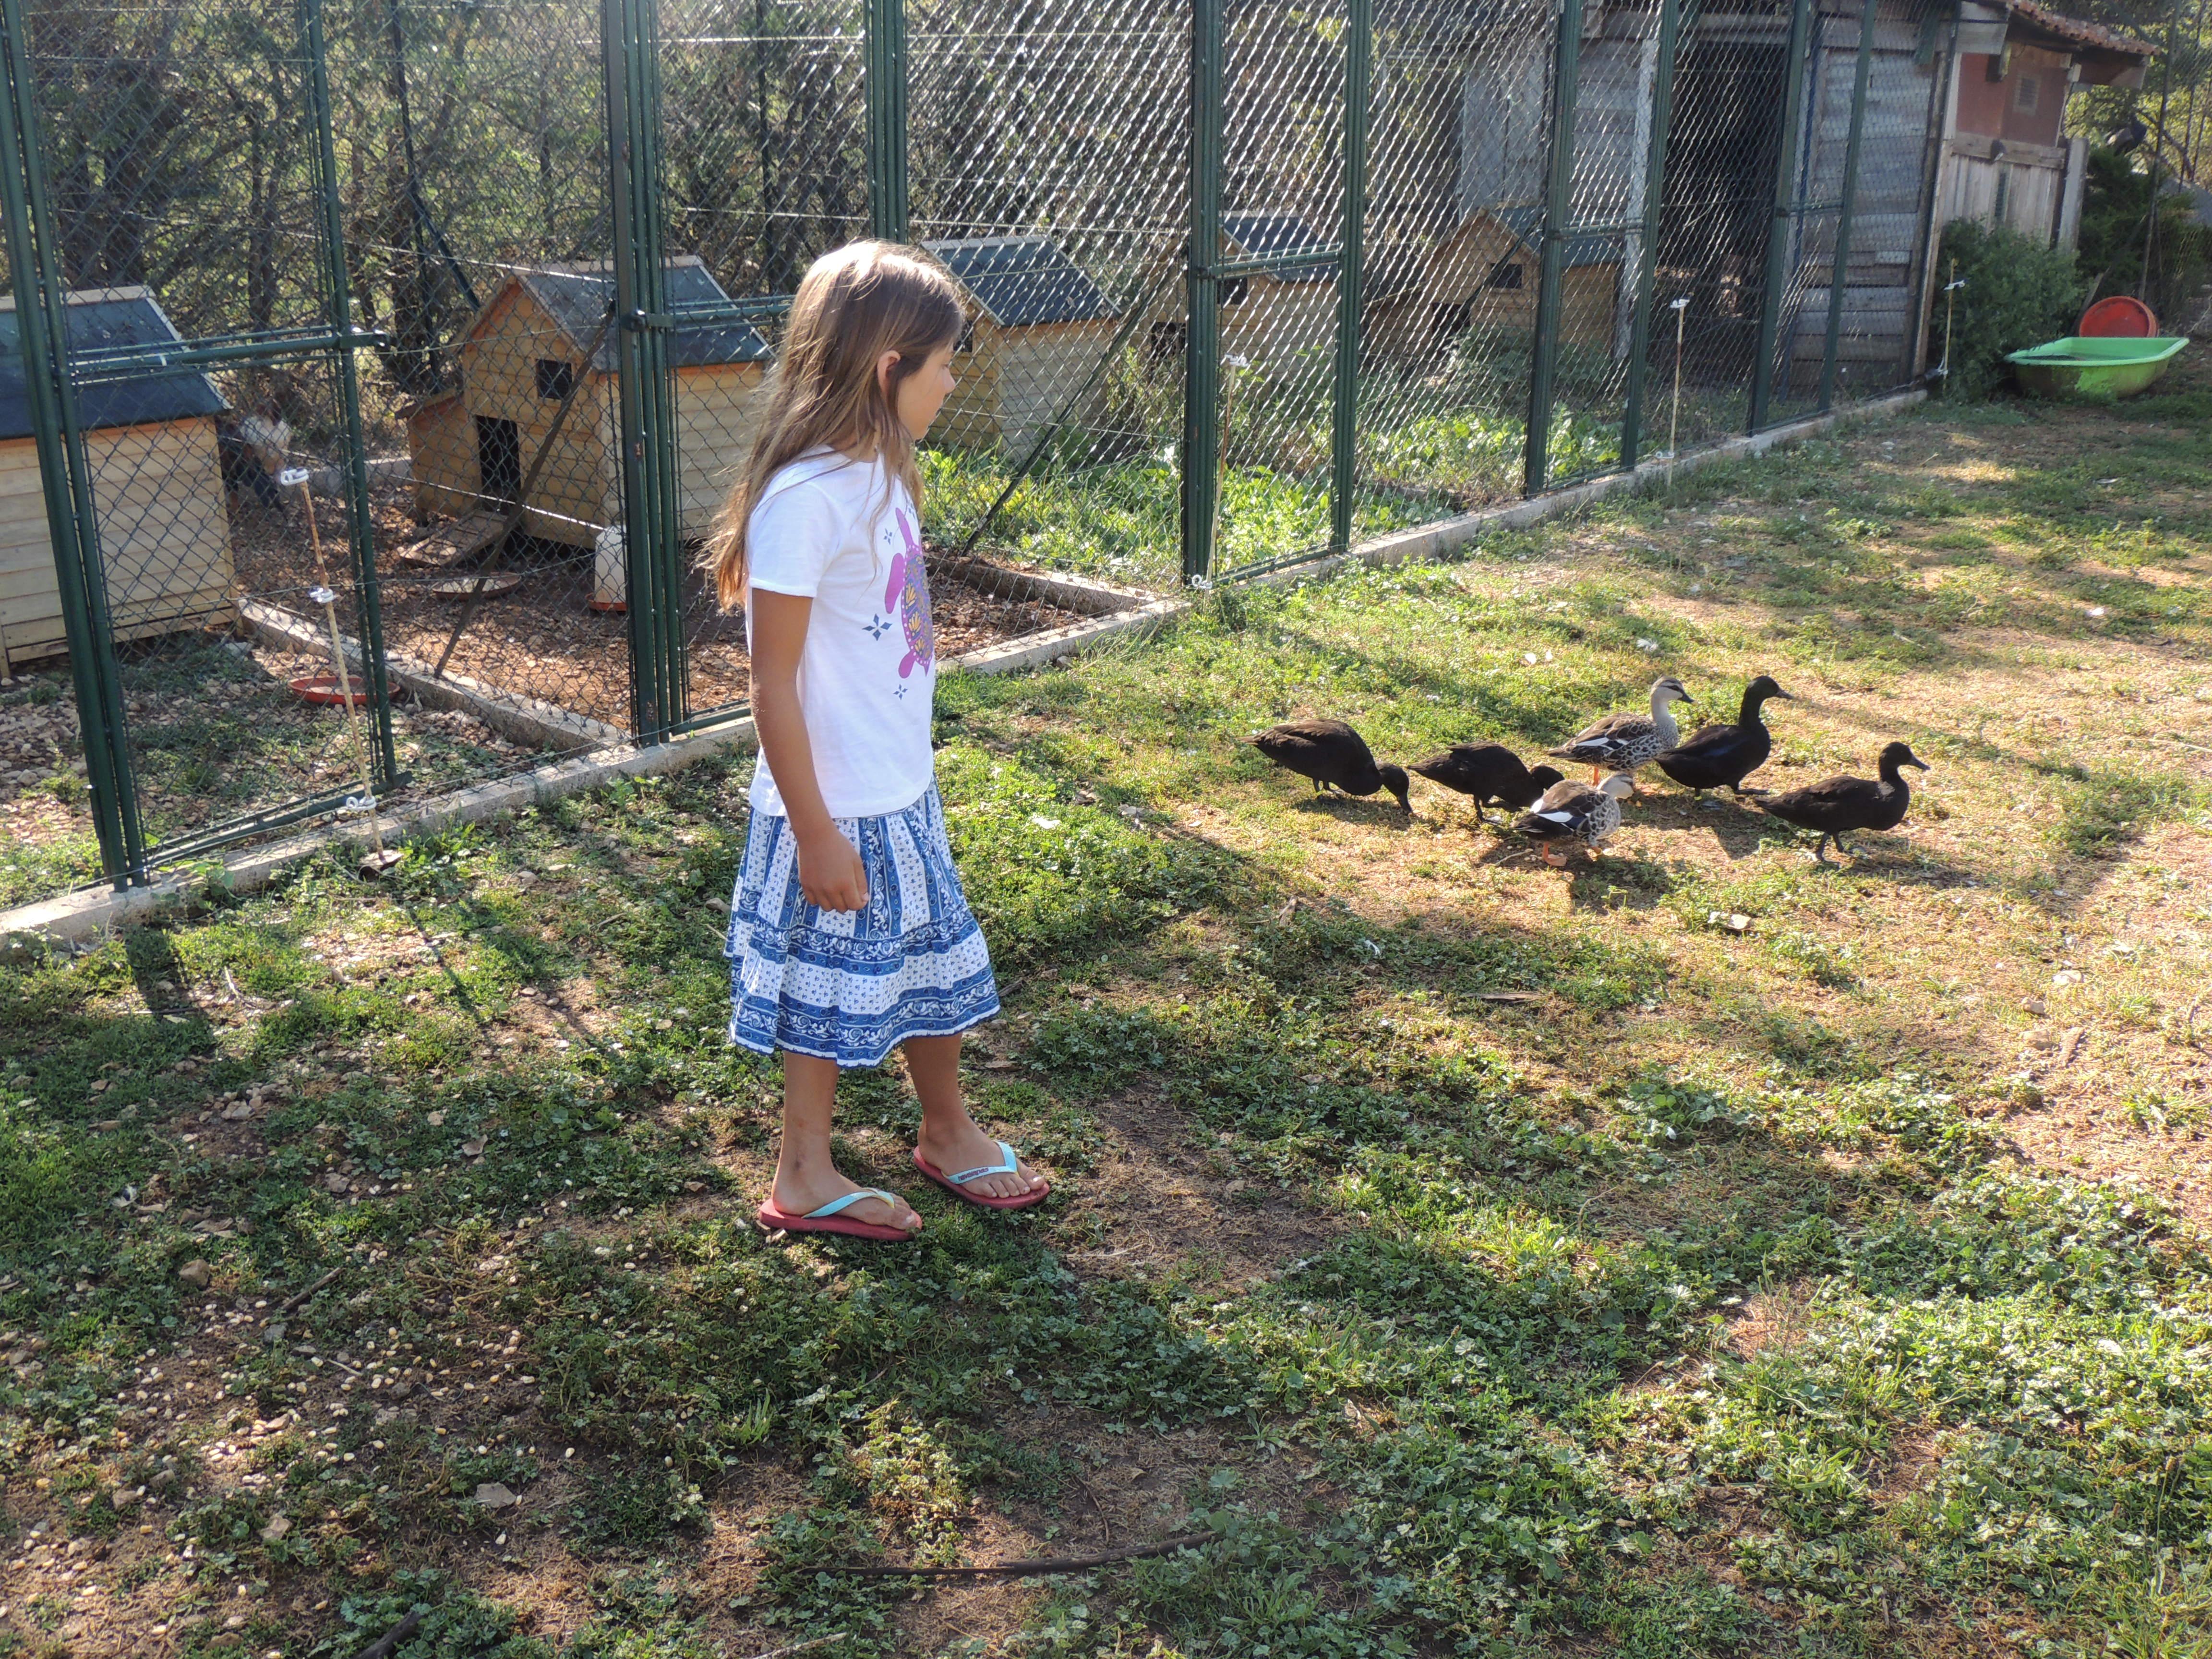 LF – Micaela and ducks 2